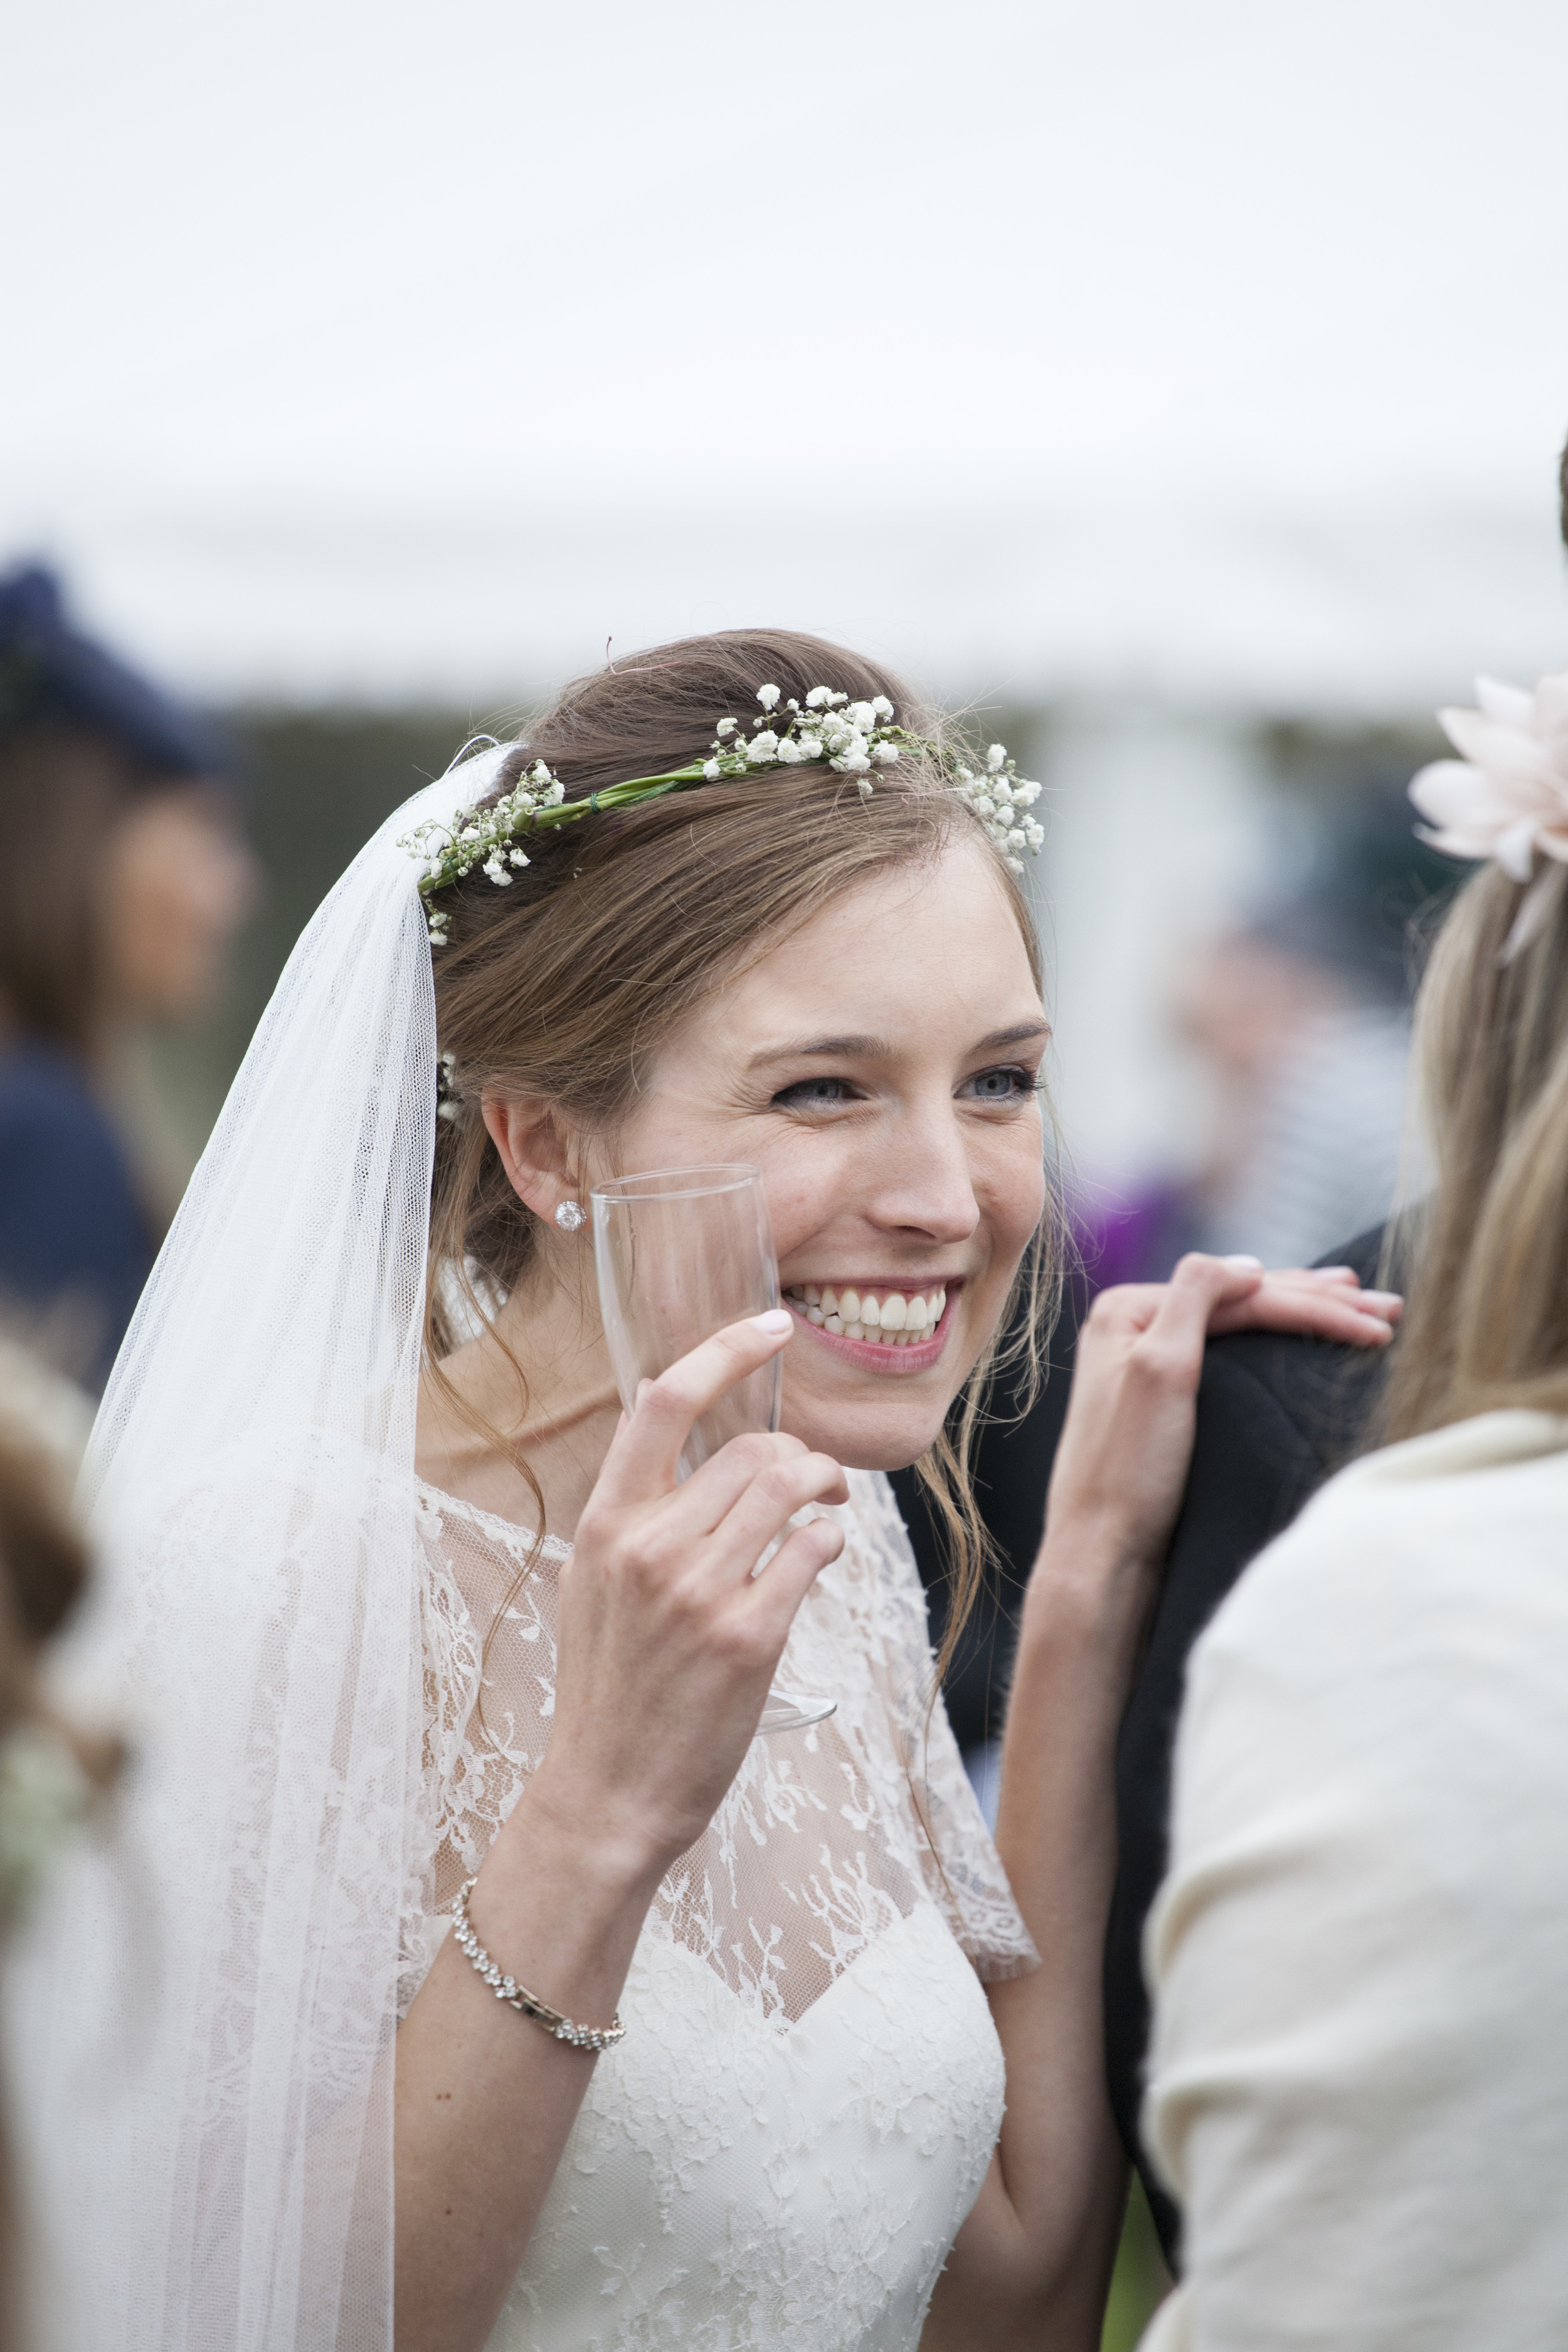 B-Sophie-Ralph-Shropshire-Wedding-Edit_93.jpg